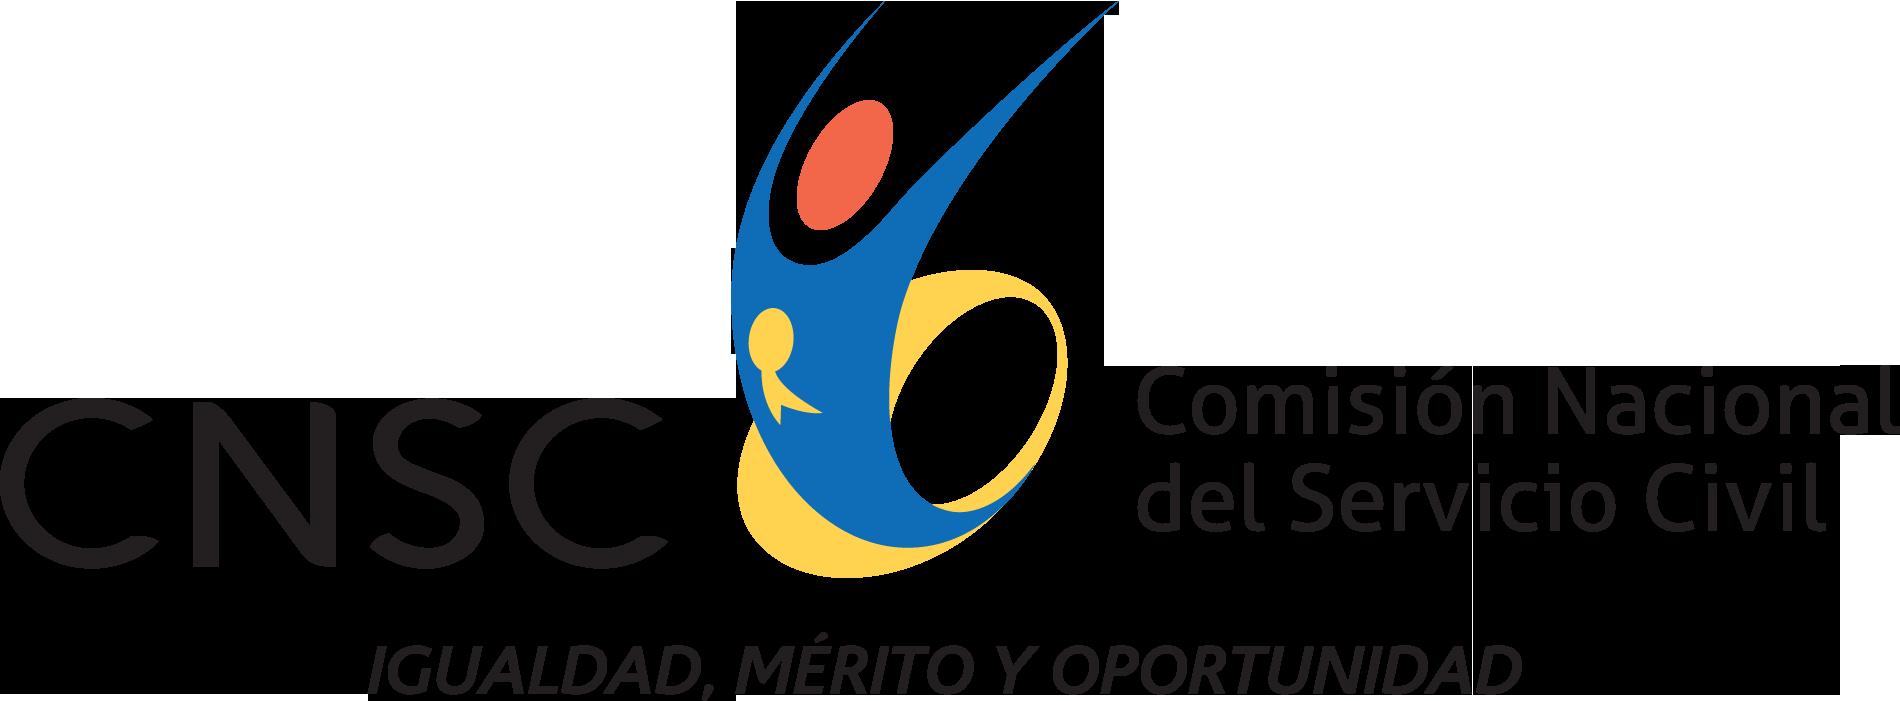 Comision logo